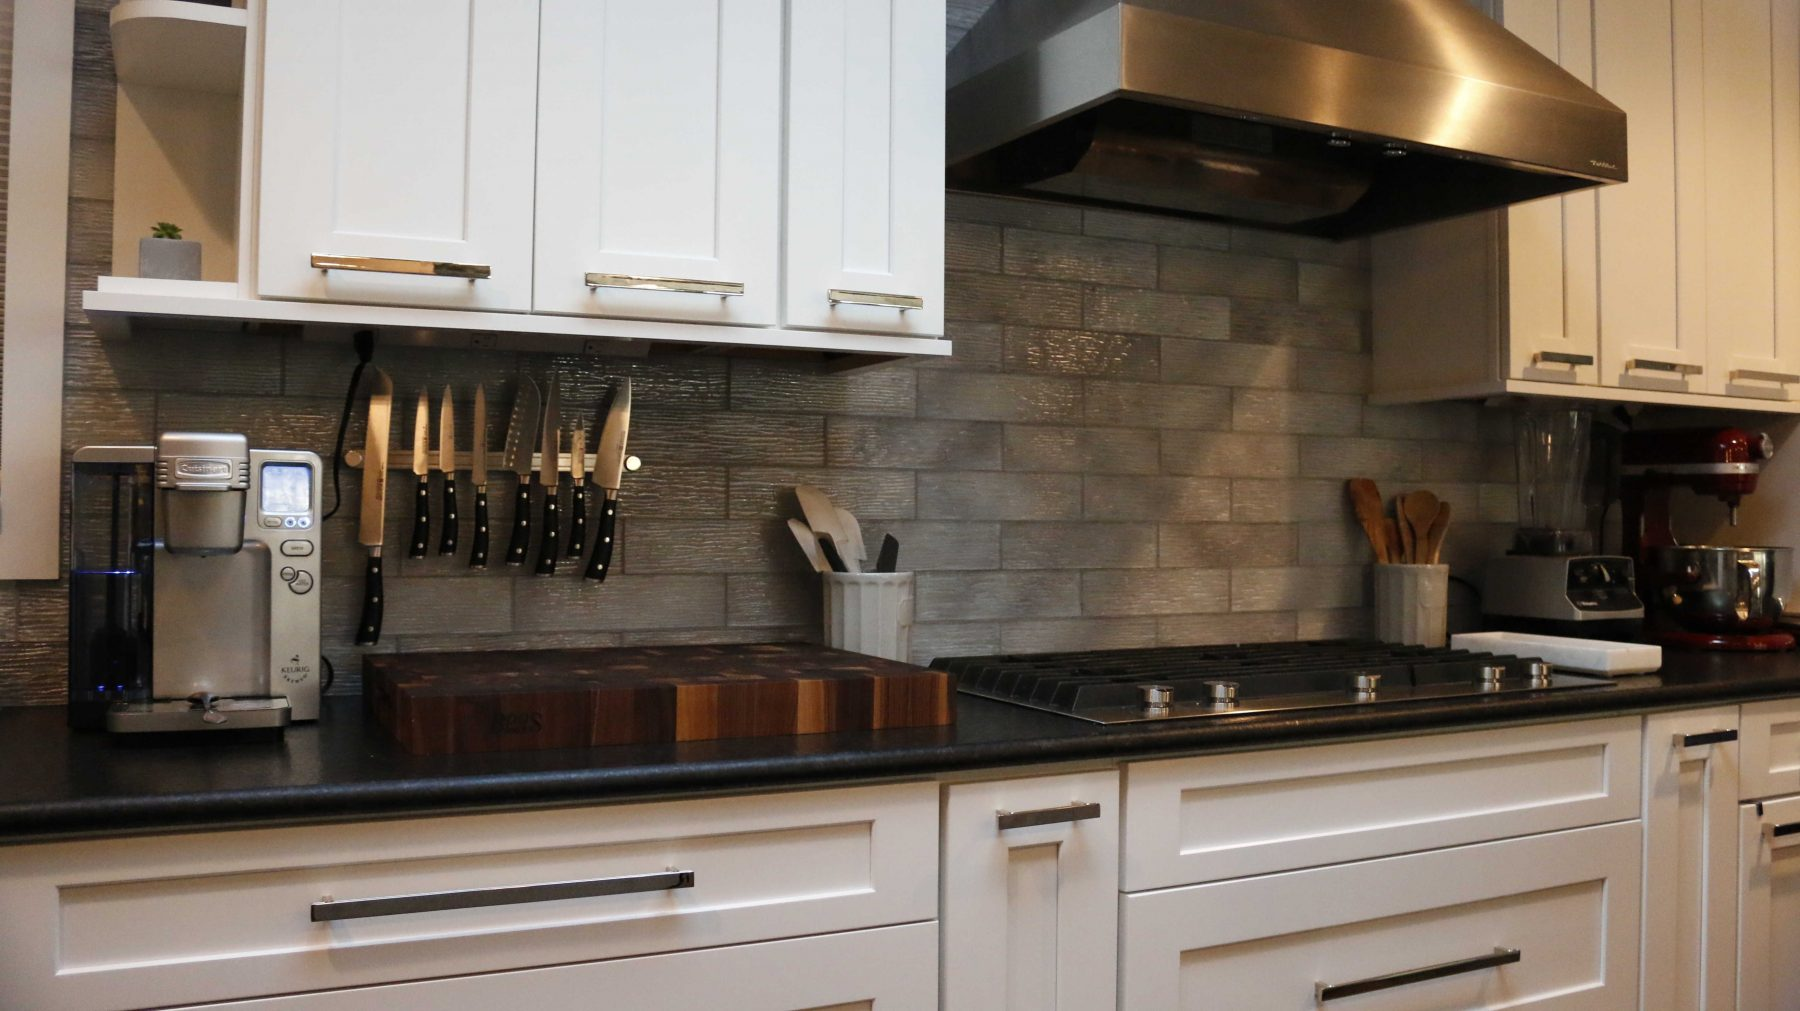 Kitchen remodeling knoxville standard kitchen bath for Kitchen remodeling knoxville tn